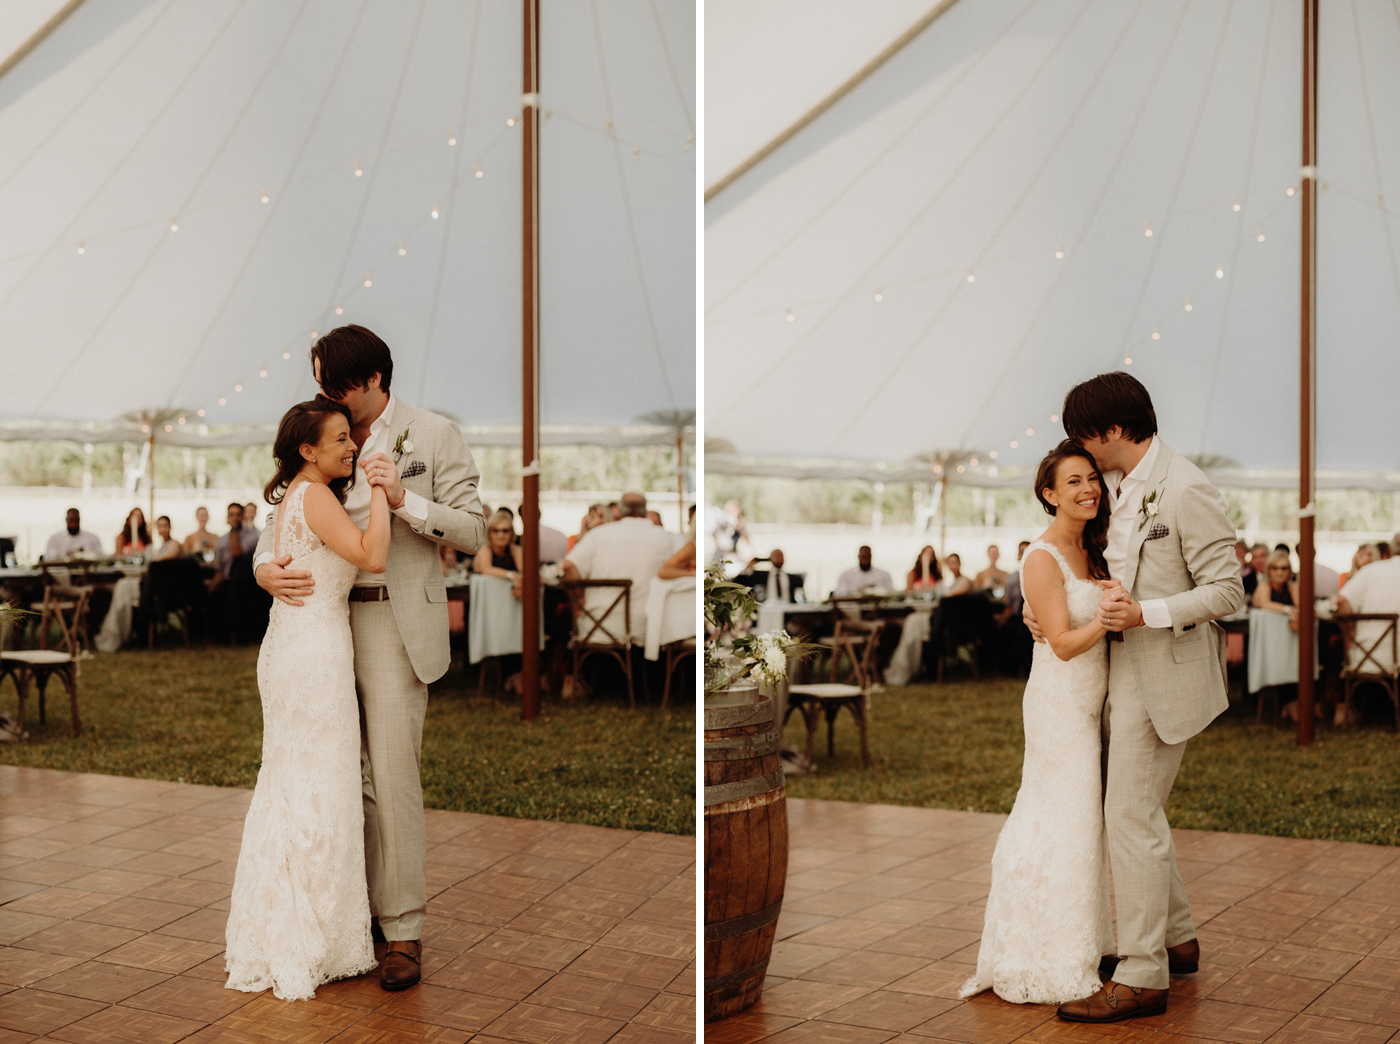 076-grand-teton-jackson-hole-wyoming-wedding.jpg